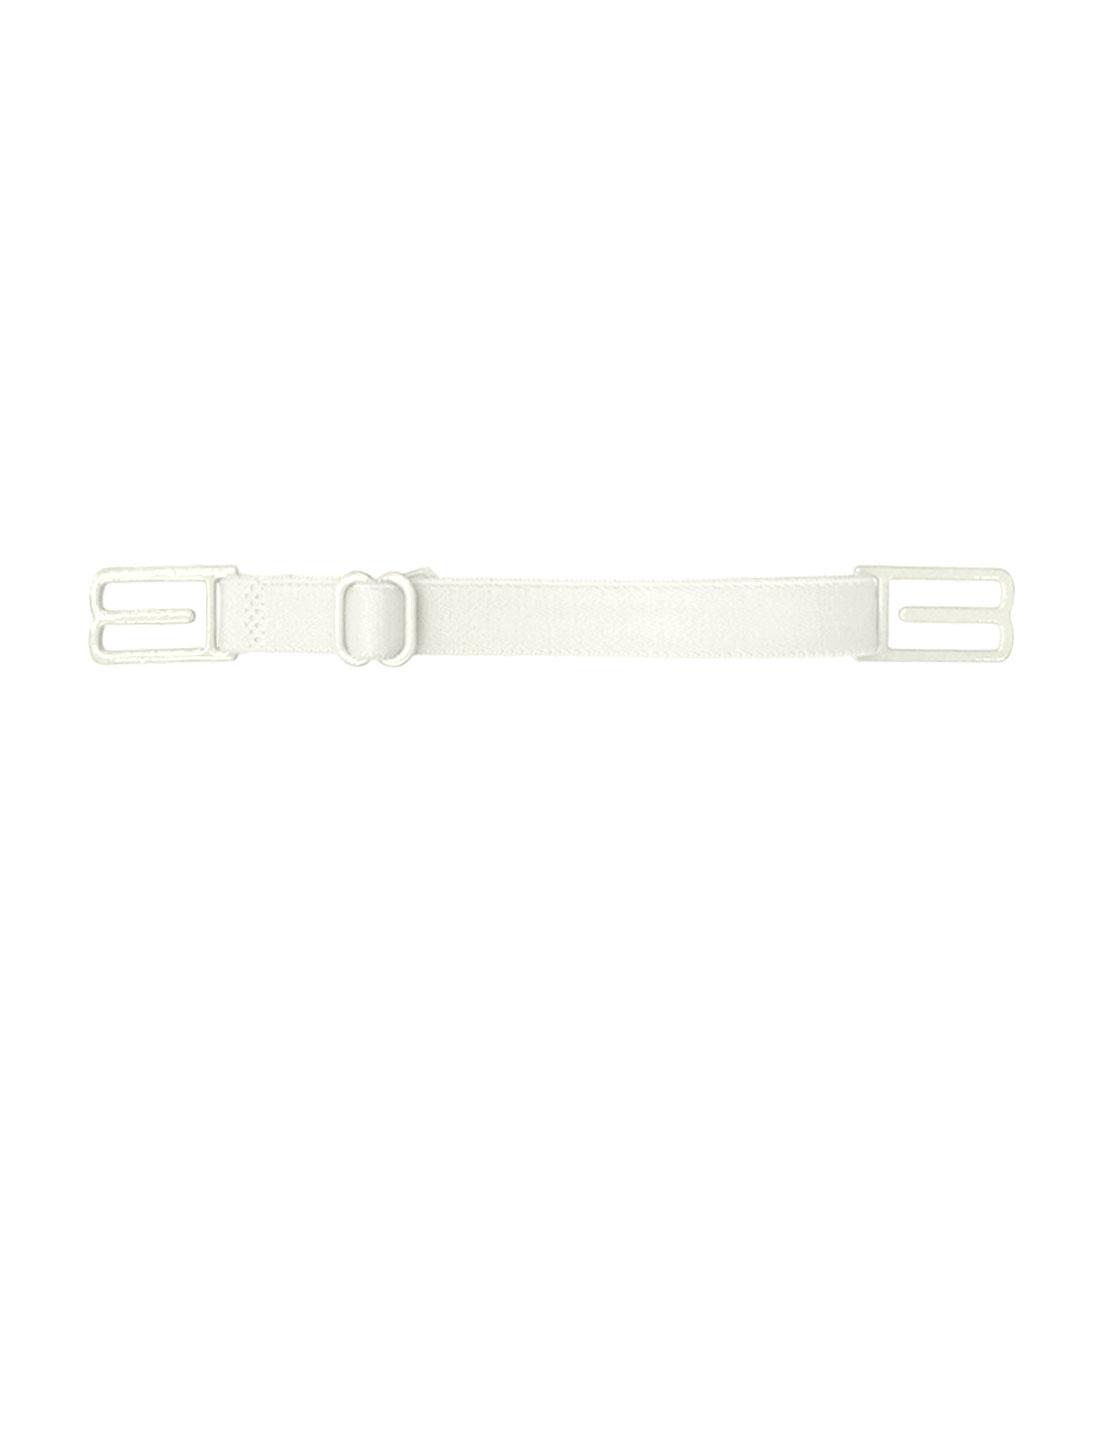 Women Elastic Band Non-Slip Adjustable Bra Straps Holder 10 Pcs White